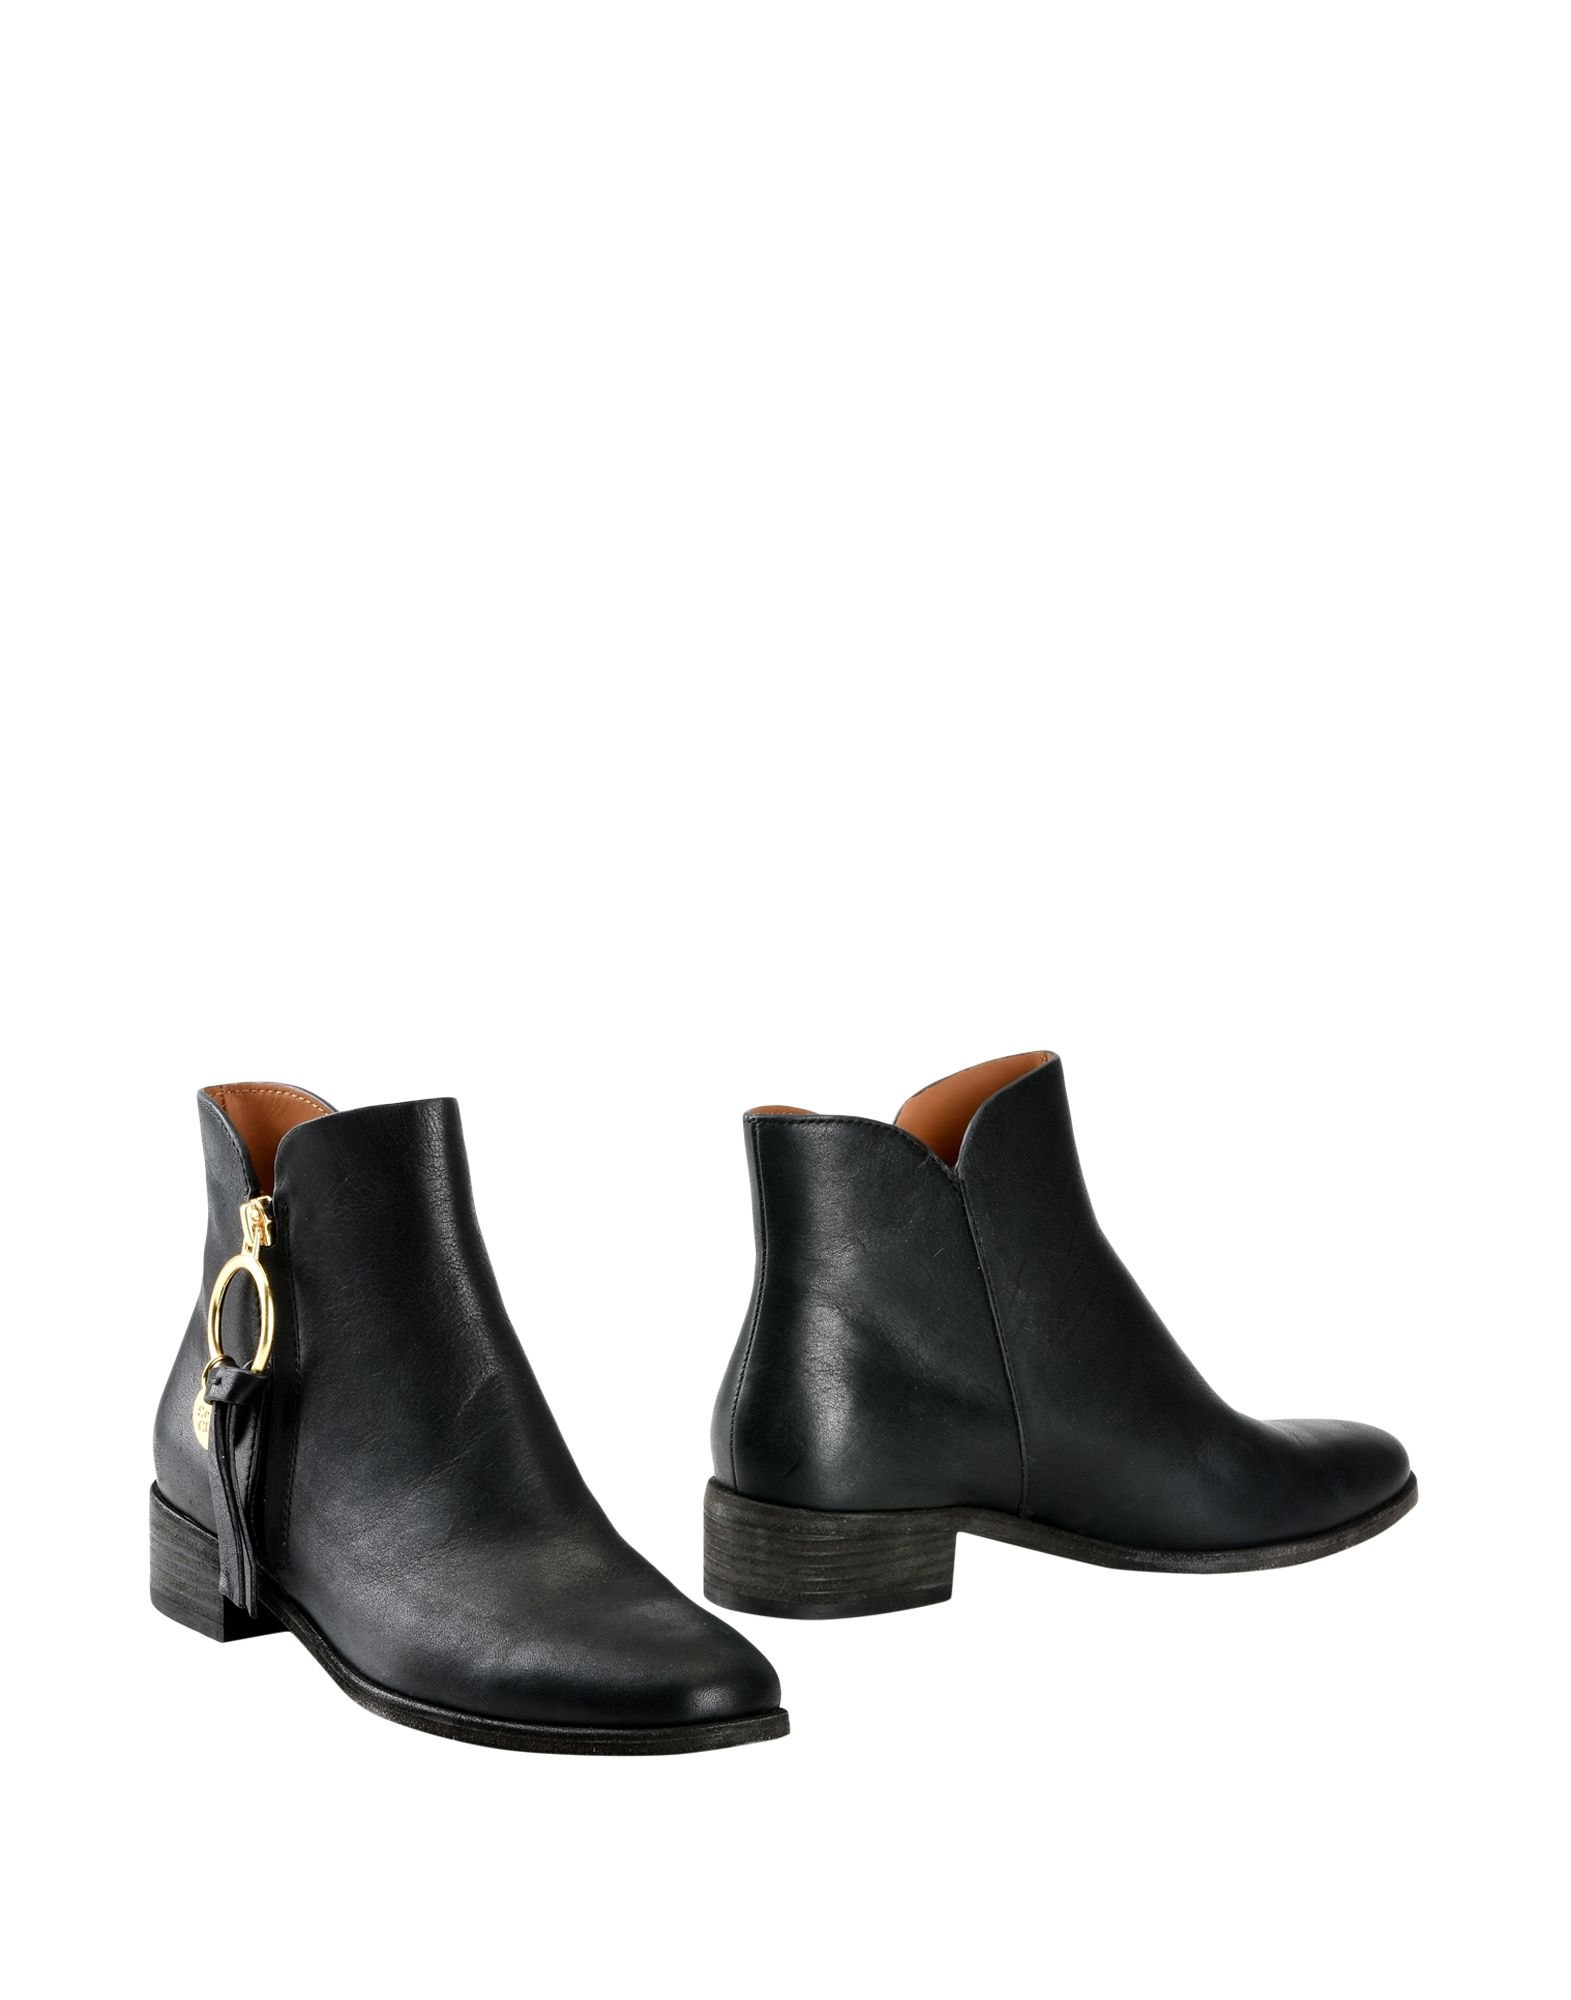 SEE BY CHLOÉ Полусапоги и высокие ботинки si by sinela полусапоги и высокие ботинки